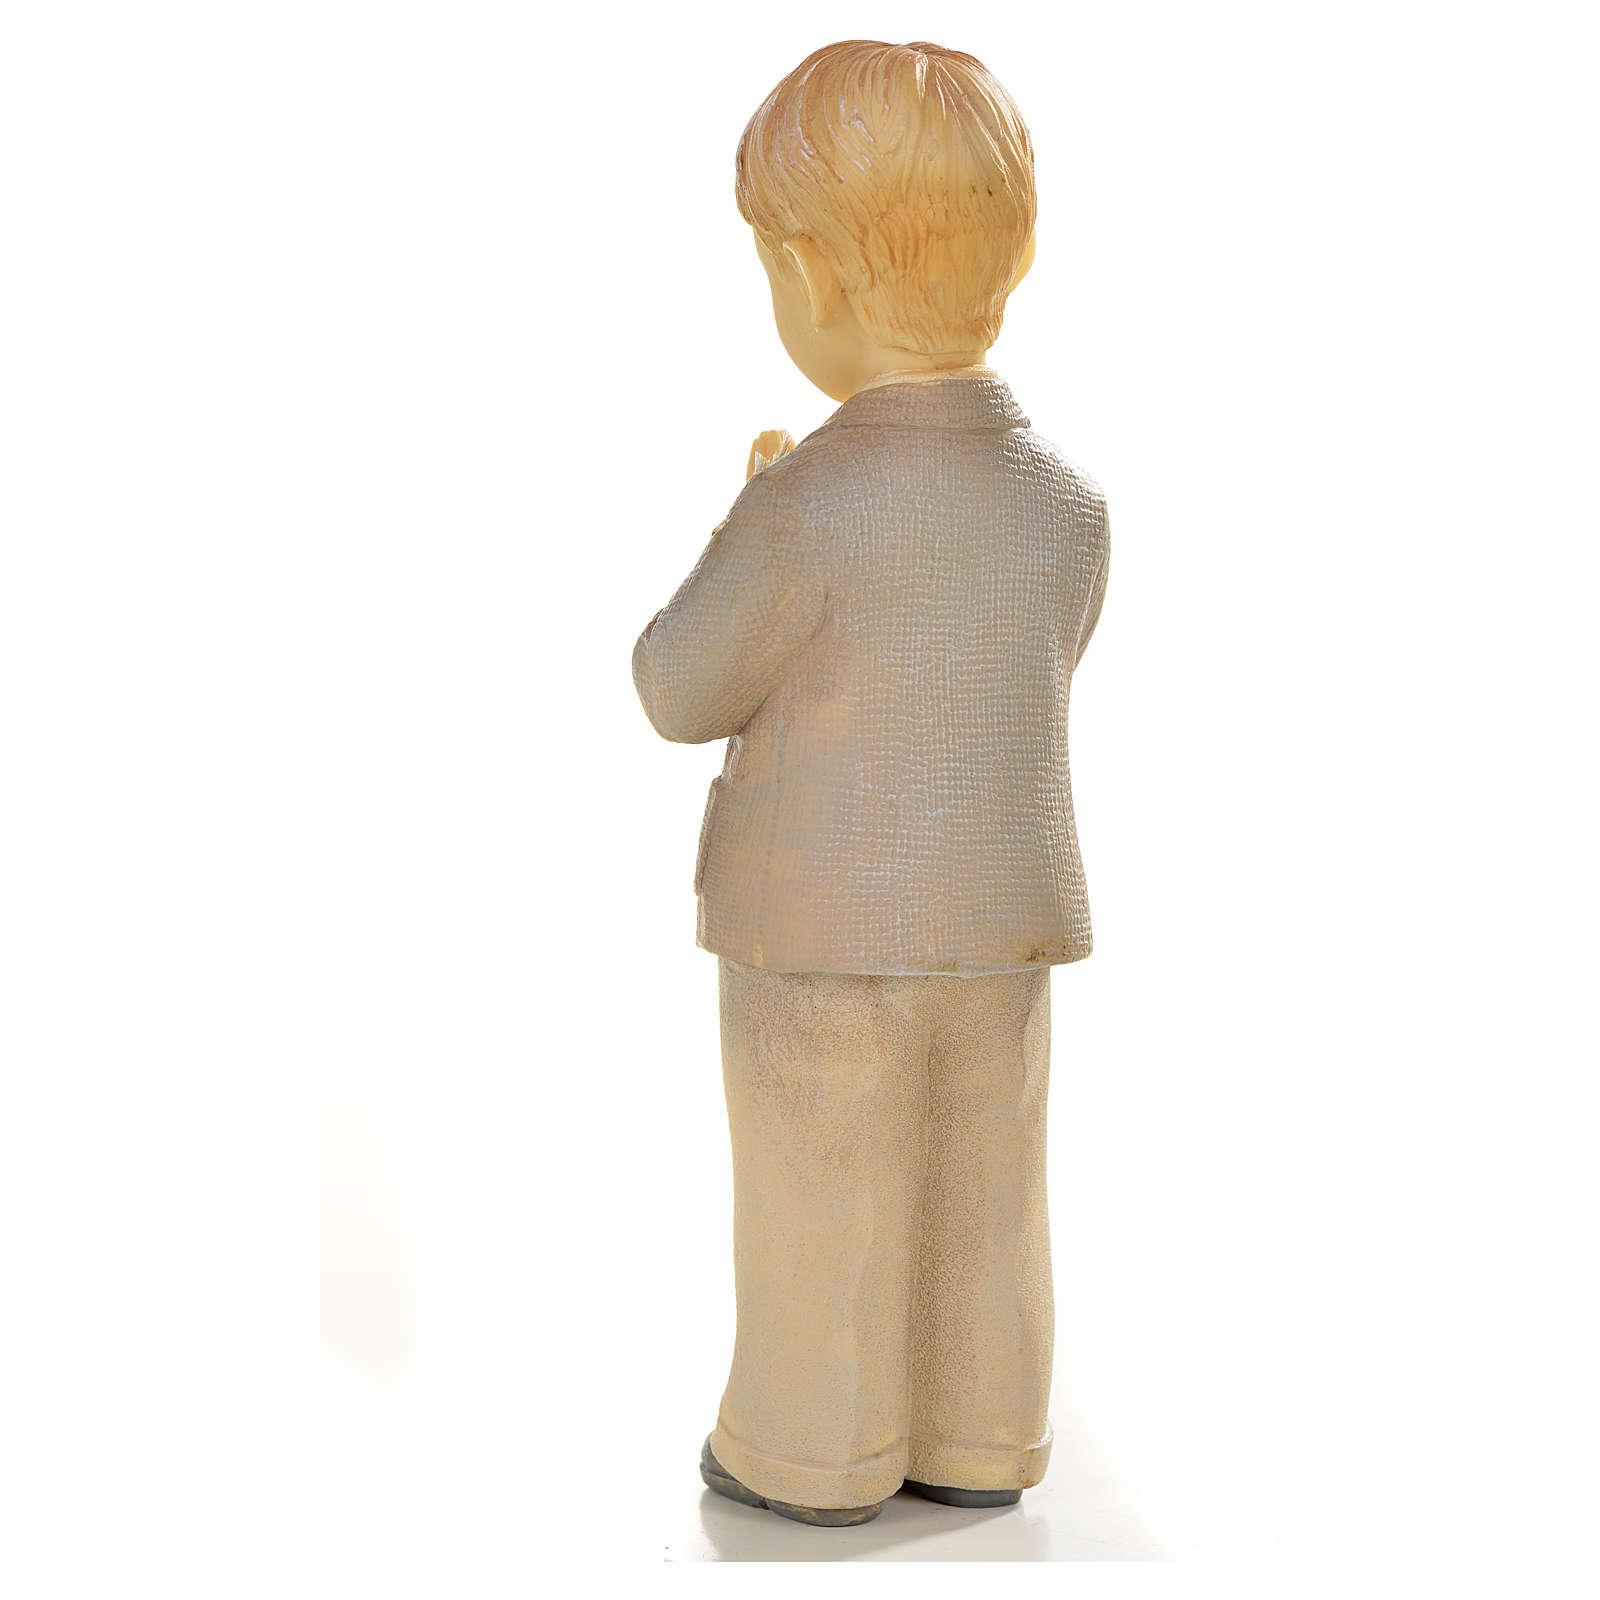 Bambino in preghiera resina 3